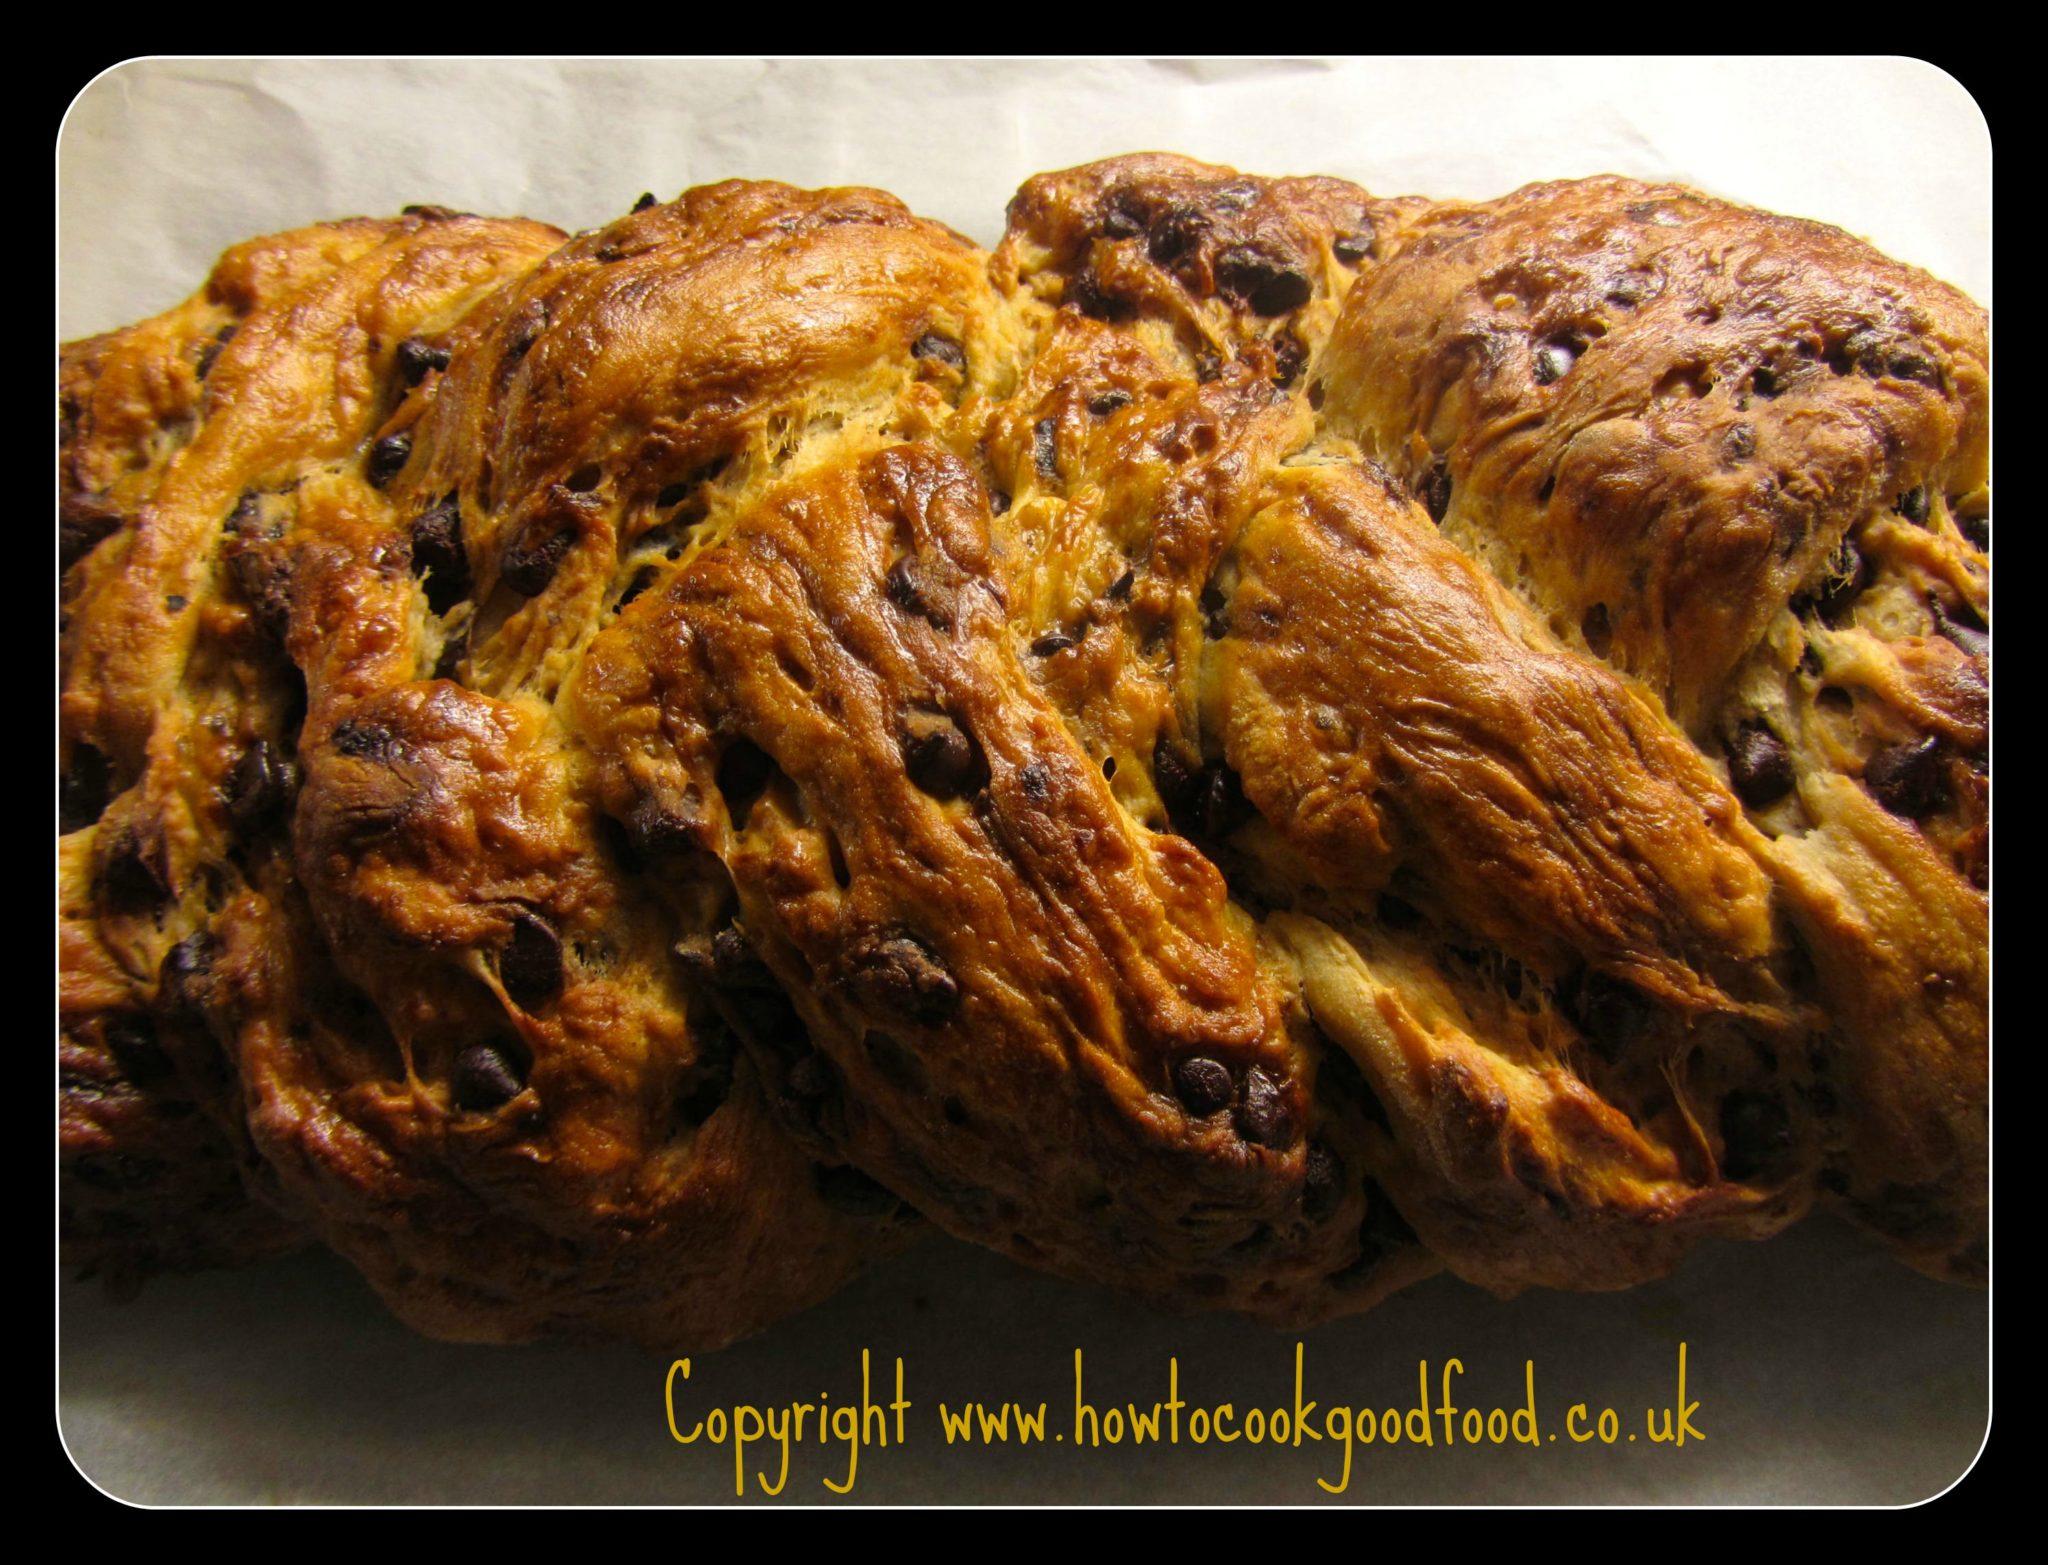 A Dark Chocolate & Prune Plaited Loaf